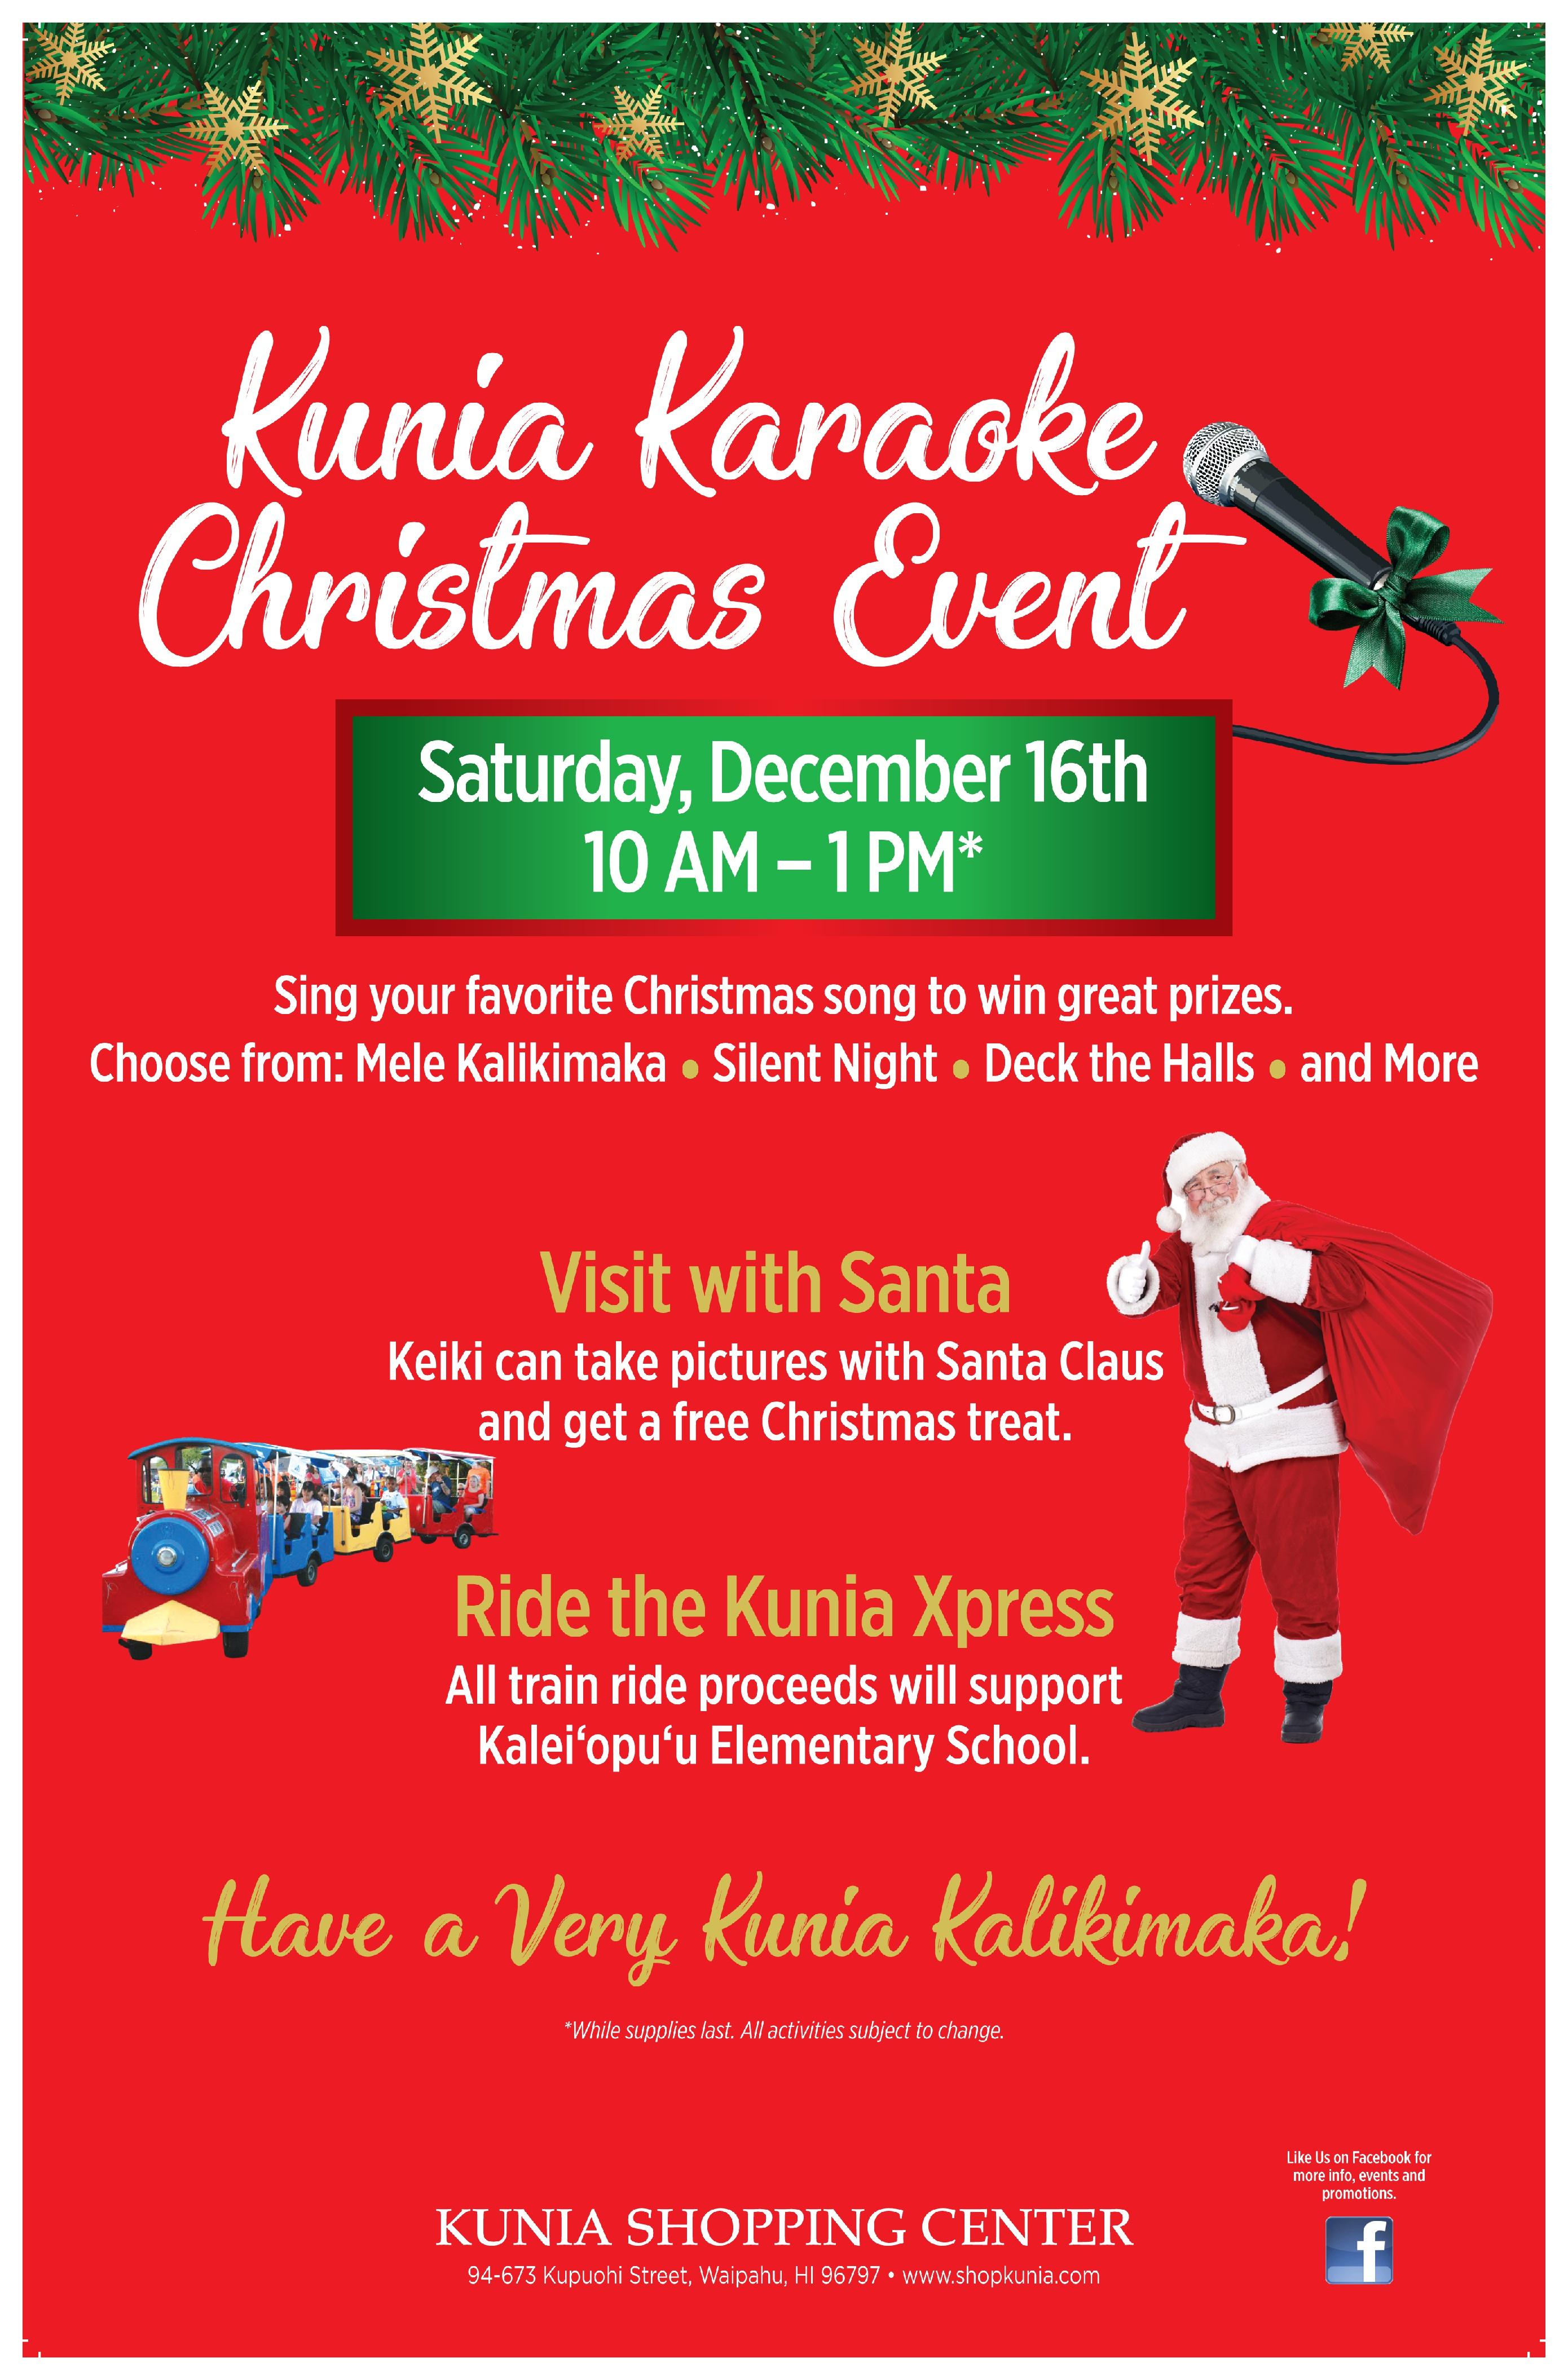 Kunia Karaoke Christmas Event! | KCCN | FM100